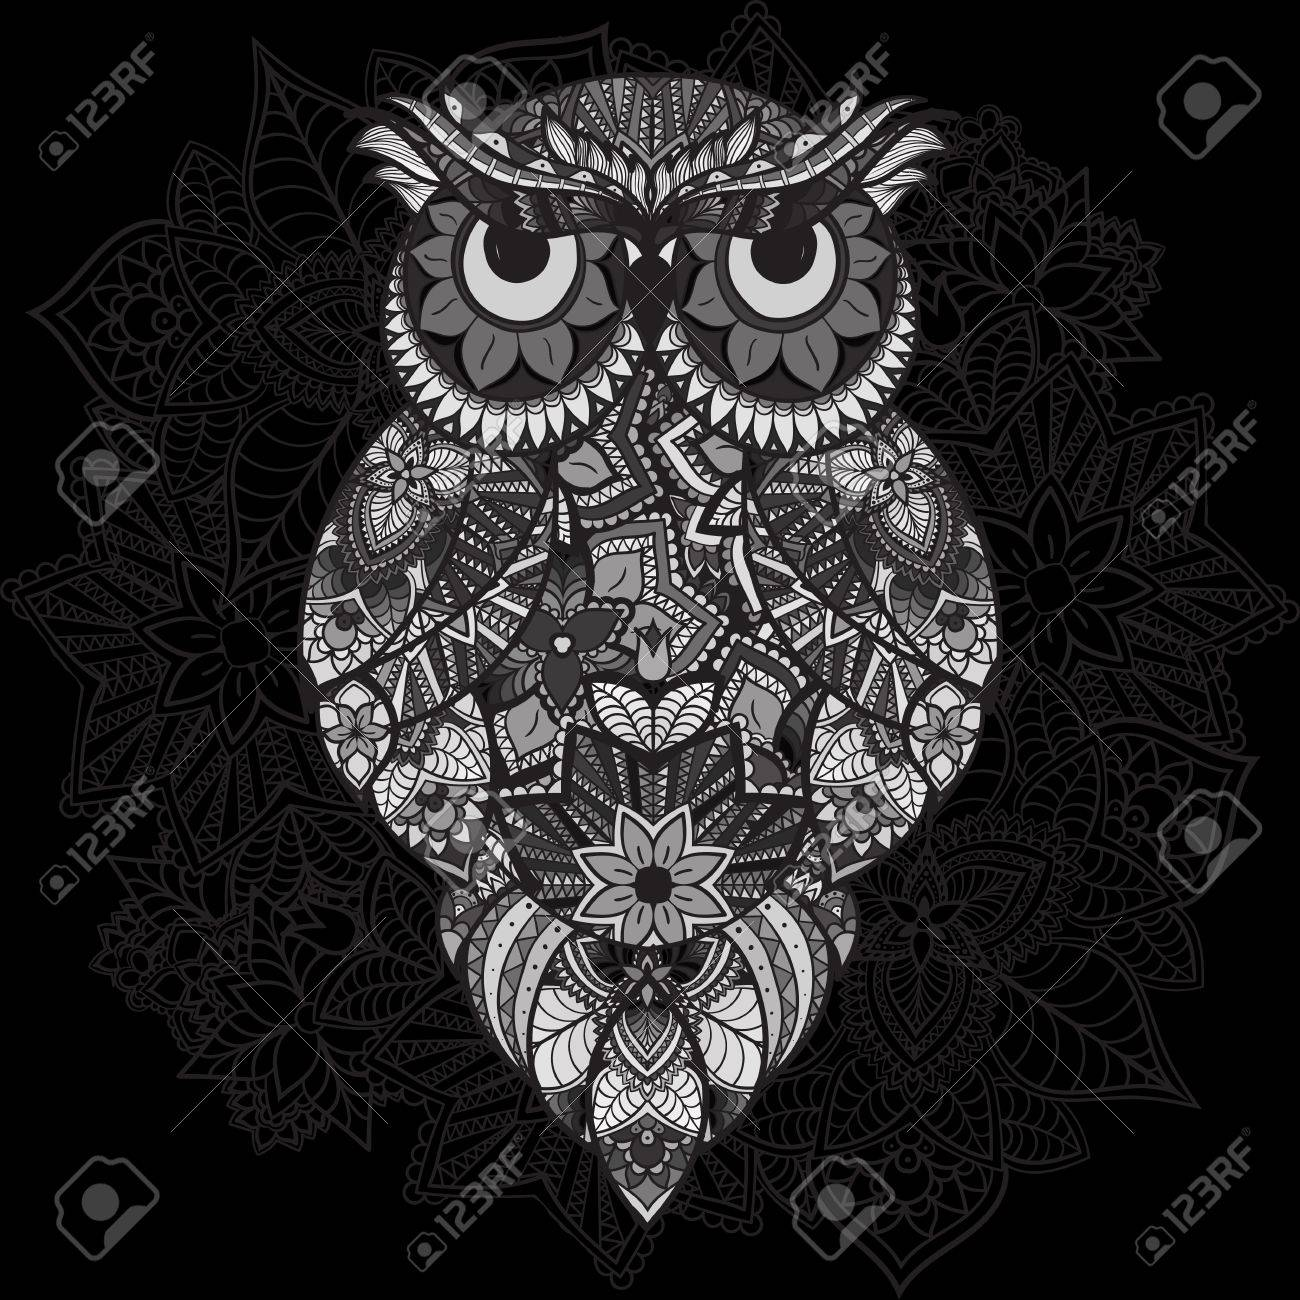 Buho Tatuaje Mandala búho del vector modelado en el fondo ornamental mandala. África, tótem,  diseño indio, tatuaje. búho del vector en la tribu. garabatos aislado búho